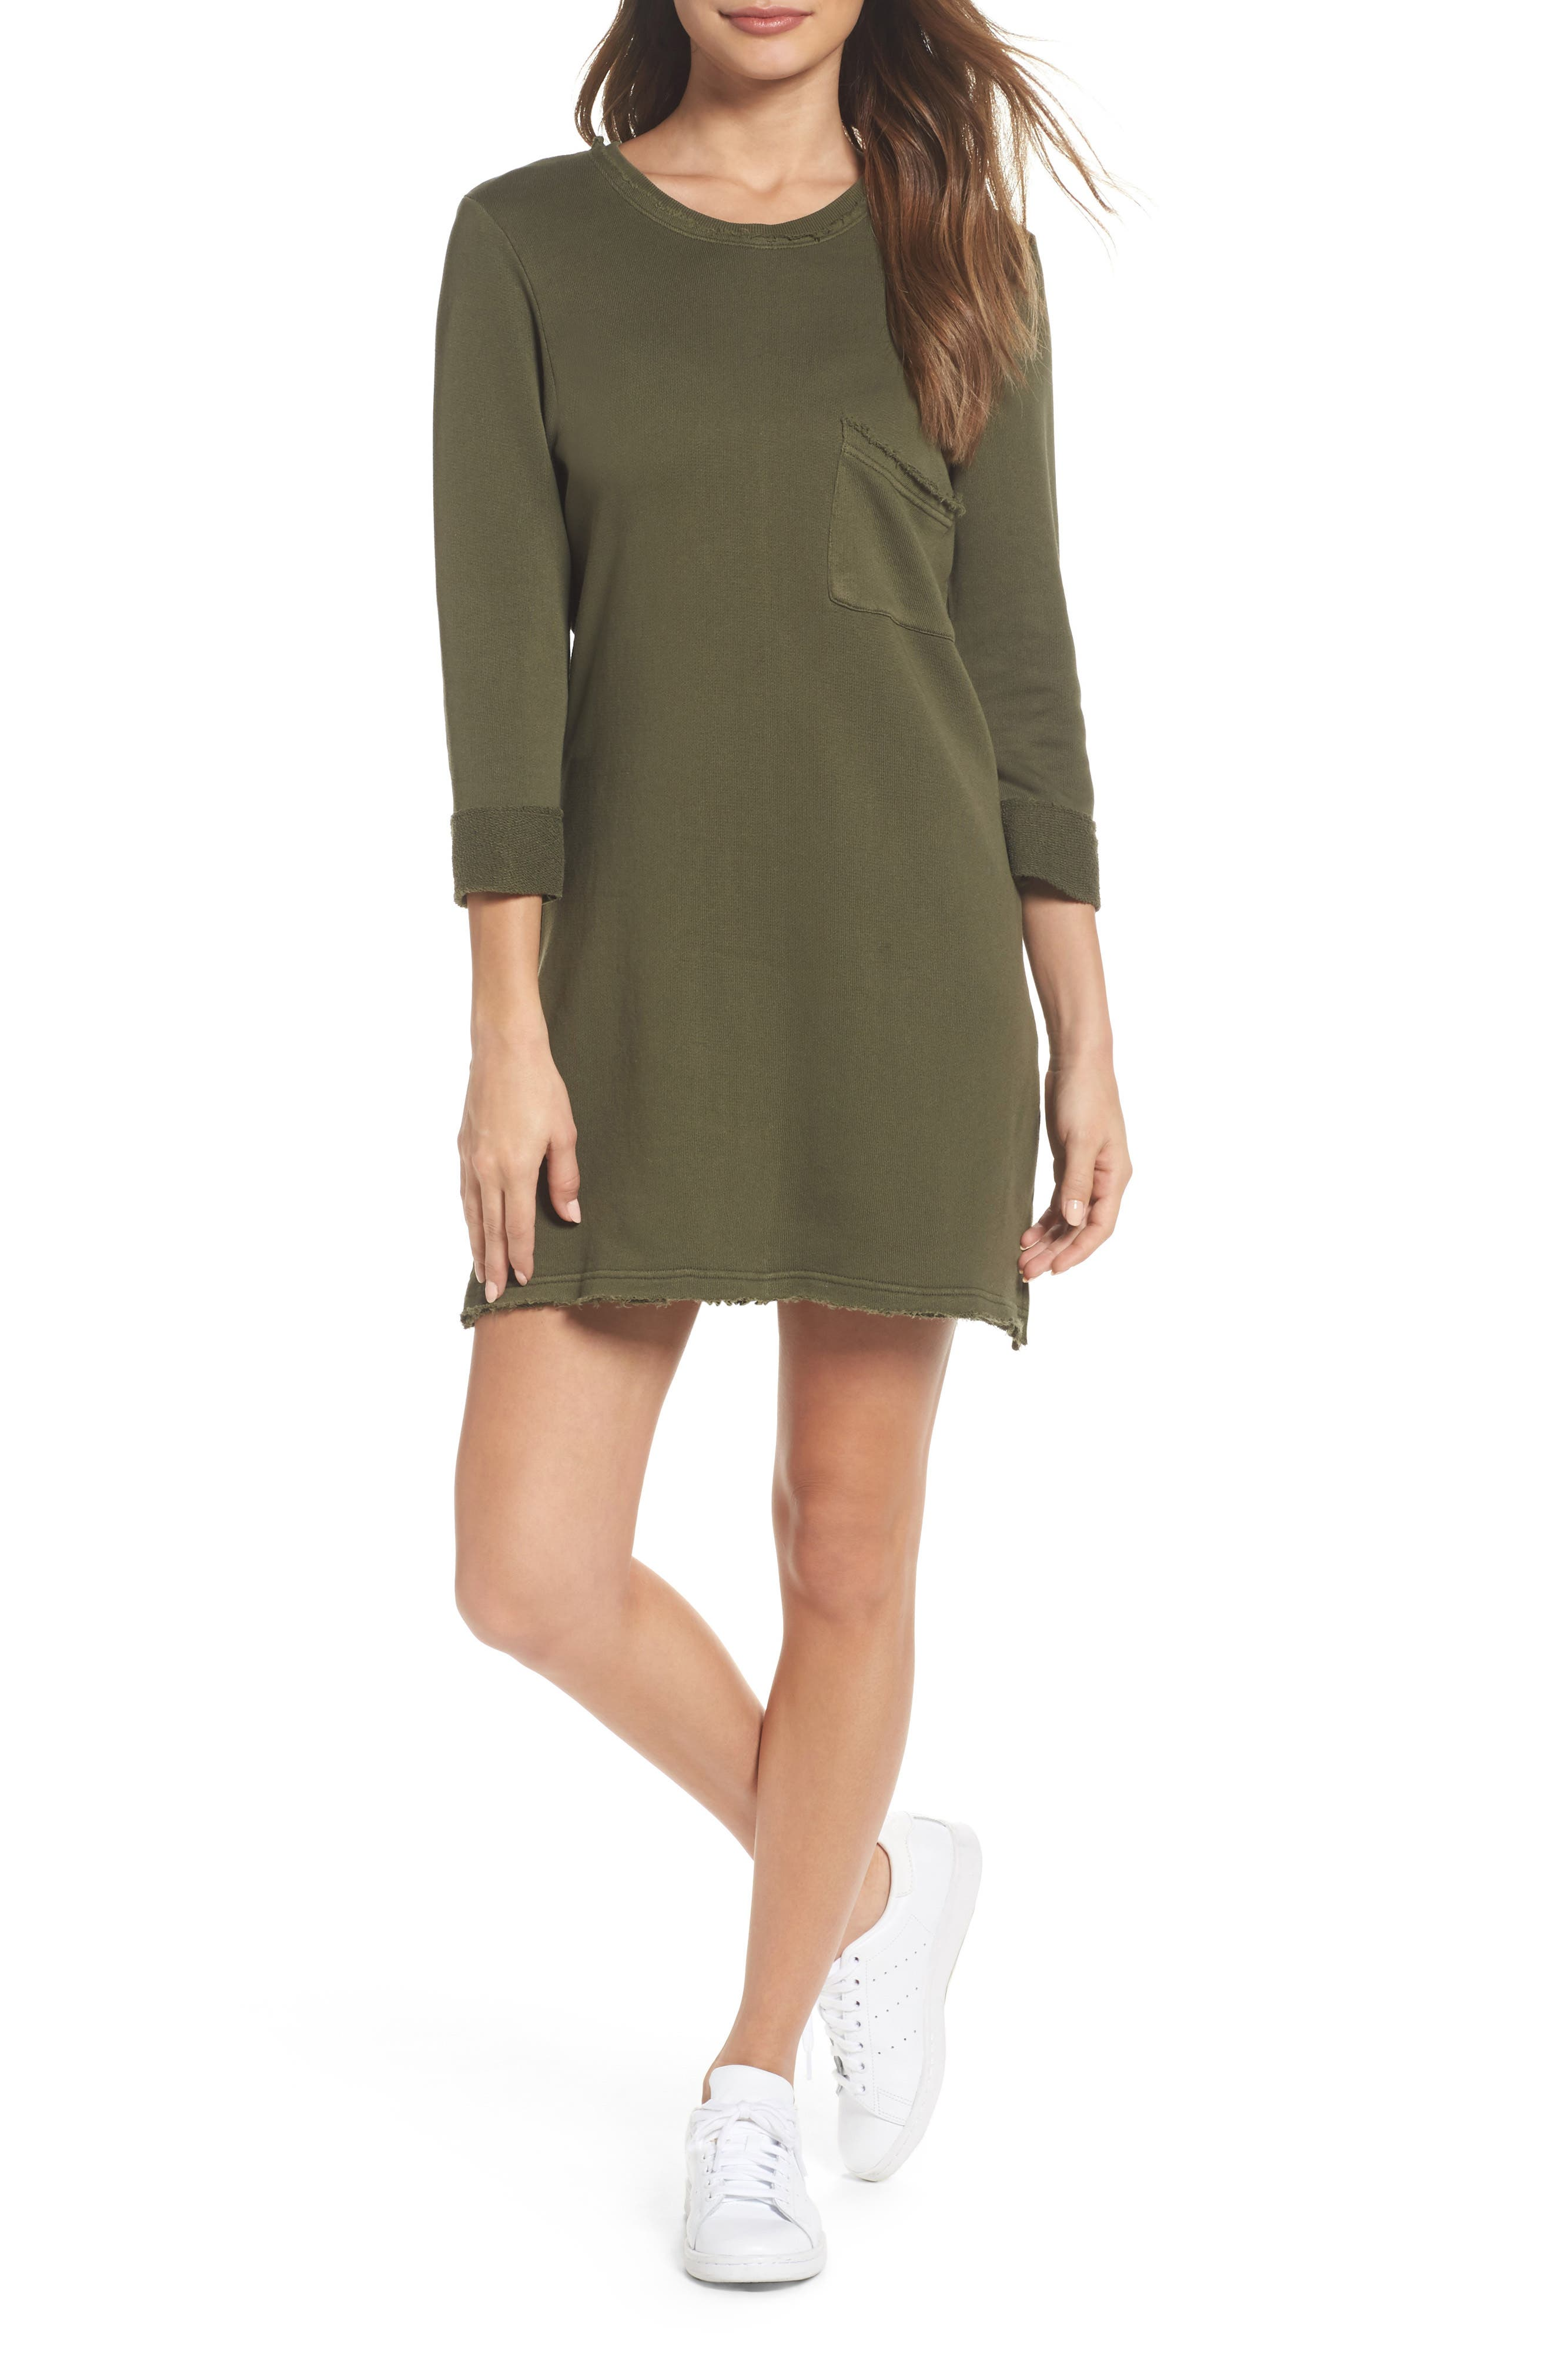 Chicago T-Shirt Dress,                             Main thumbnail 1, color,                             Military Green